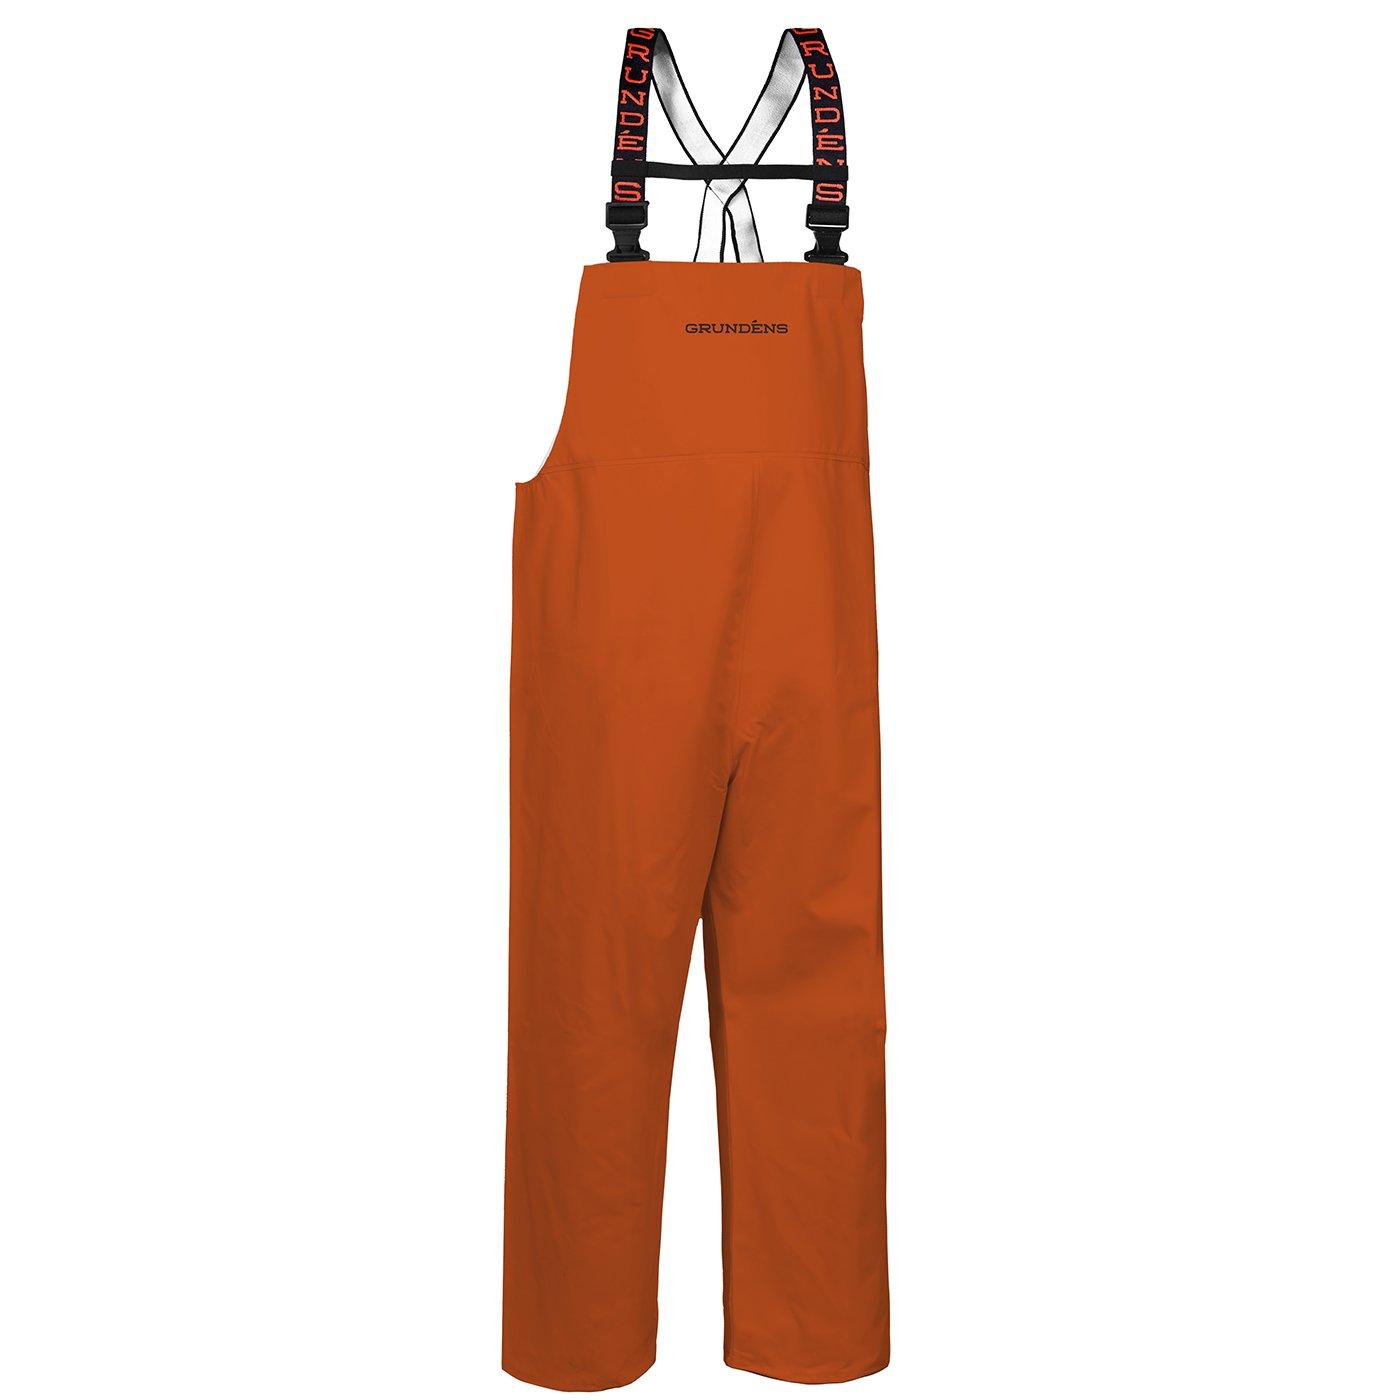 Grundens PANTS メンズ B074WJ45QJ X-Large|オレンジ オレンジ X-Large